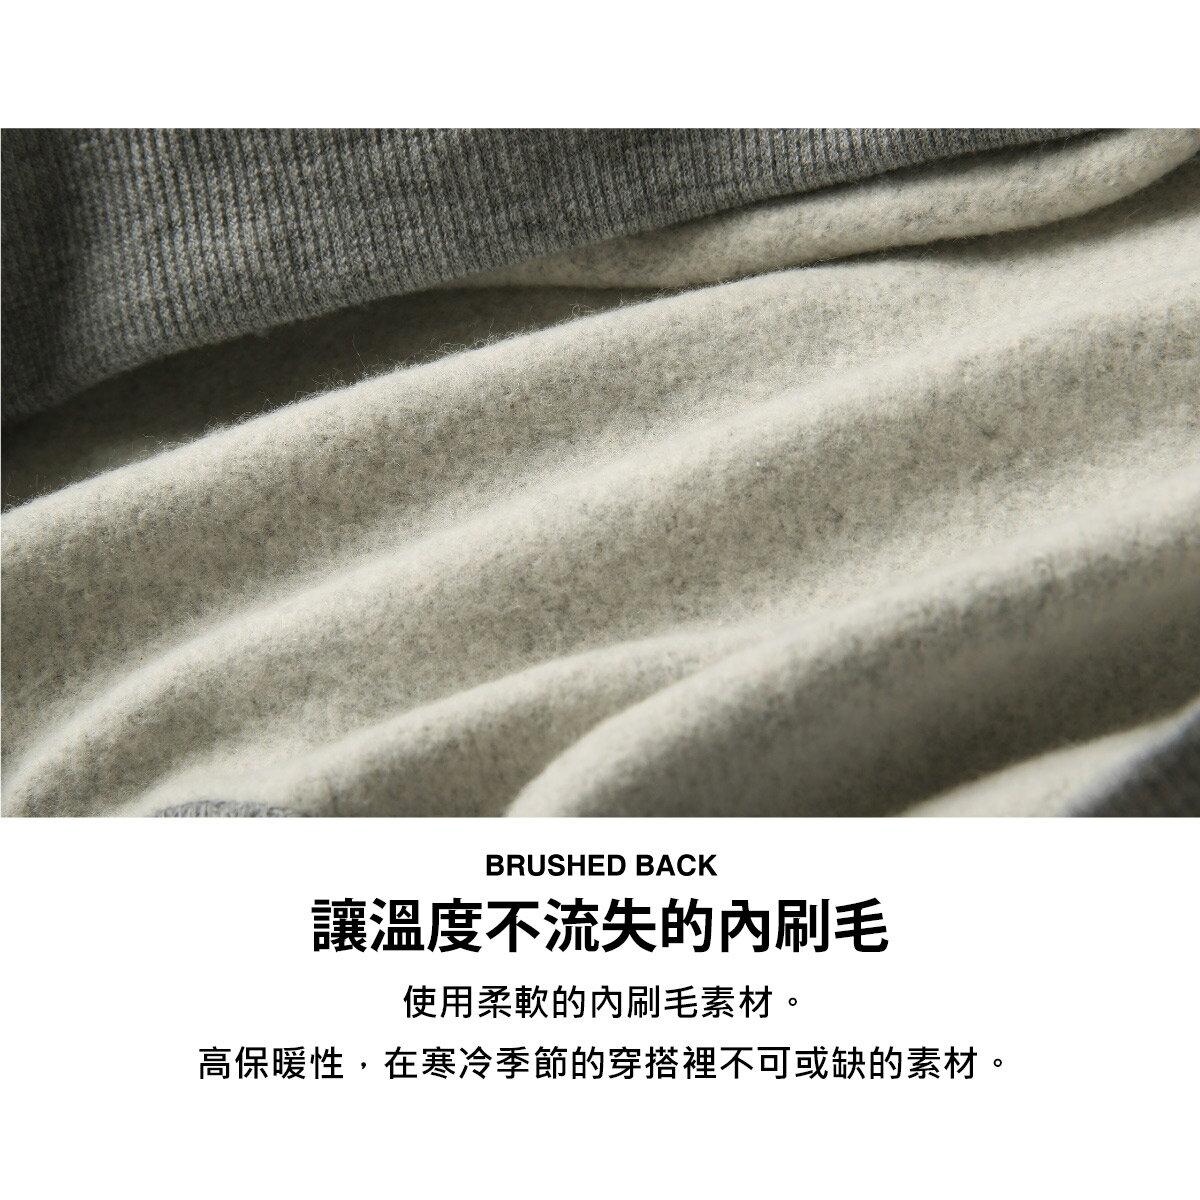 【FILA】LOGO刺繡內刷毛運動衫 7